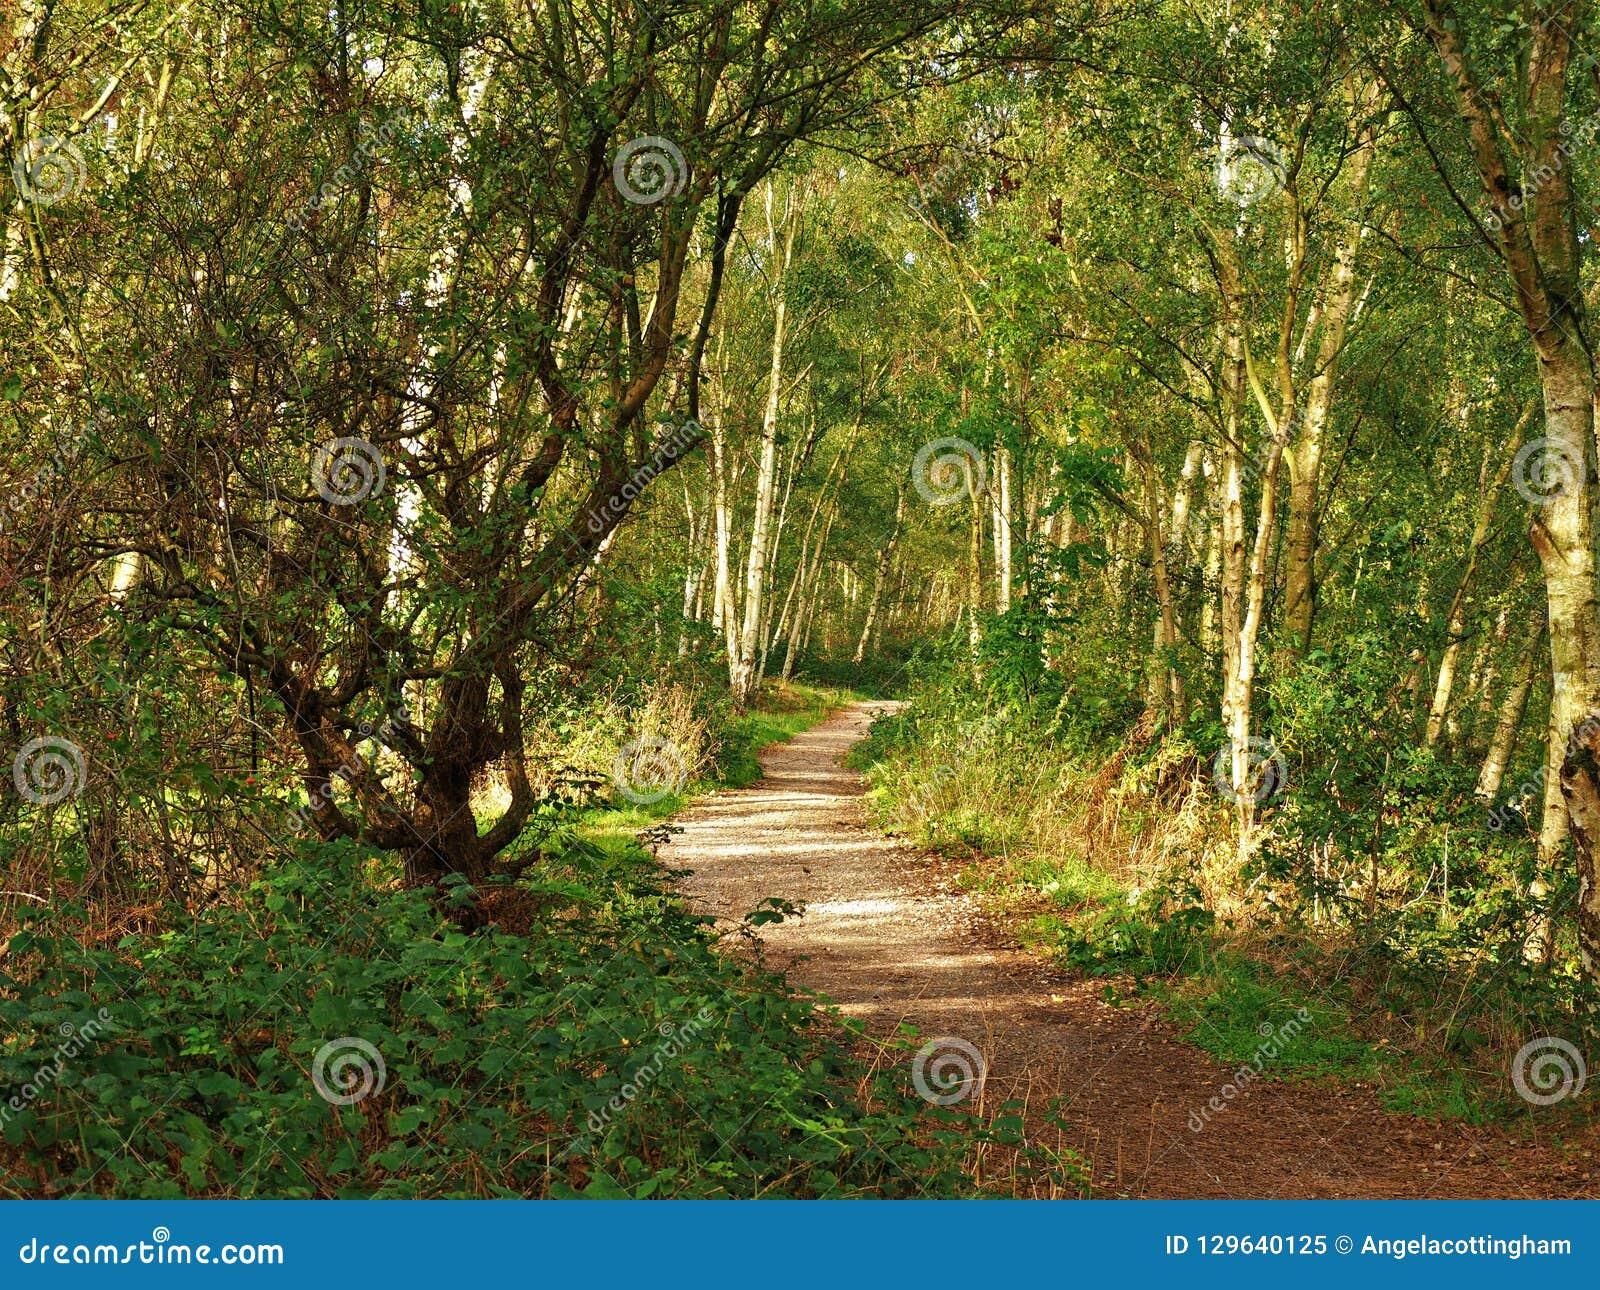 Path Through Trees At Fairburn Ings, Yorkshire, England